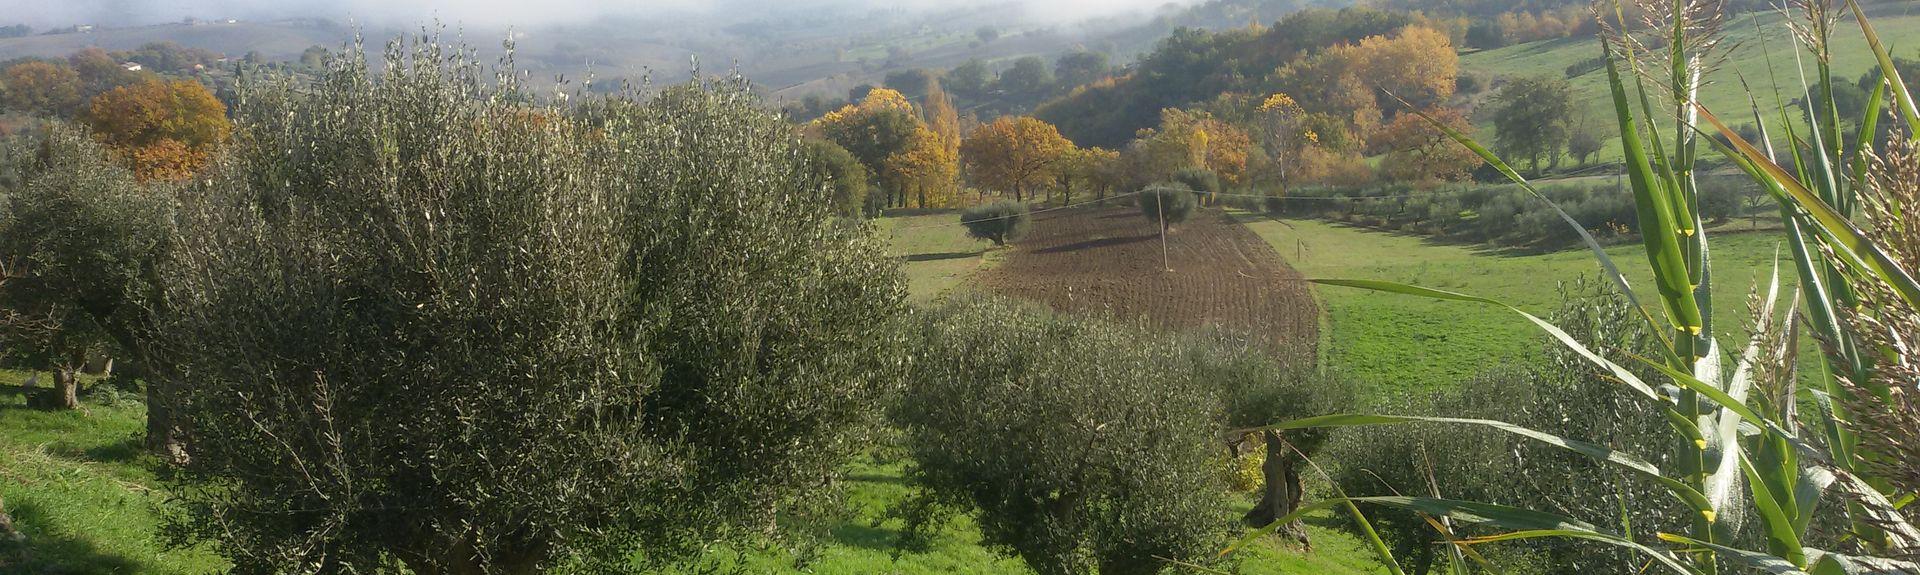 Treia, Marches, Italie